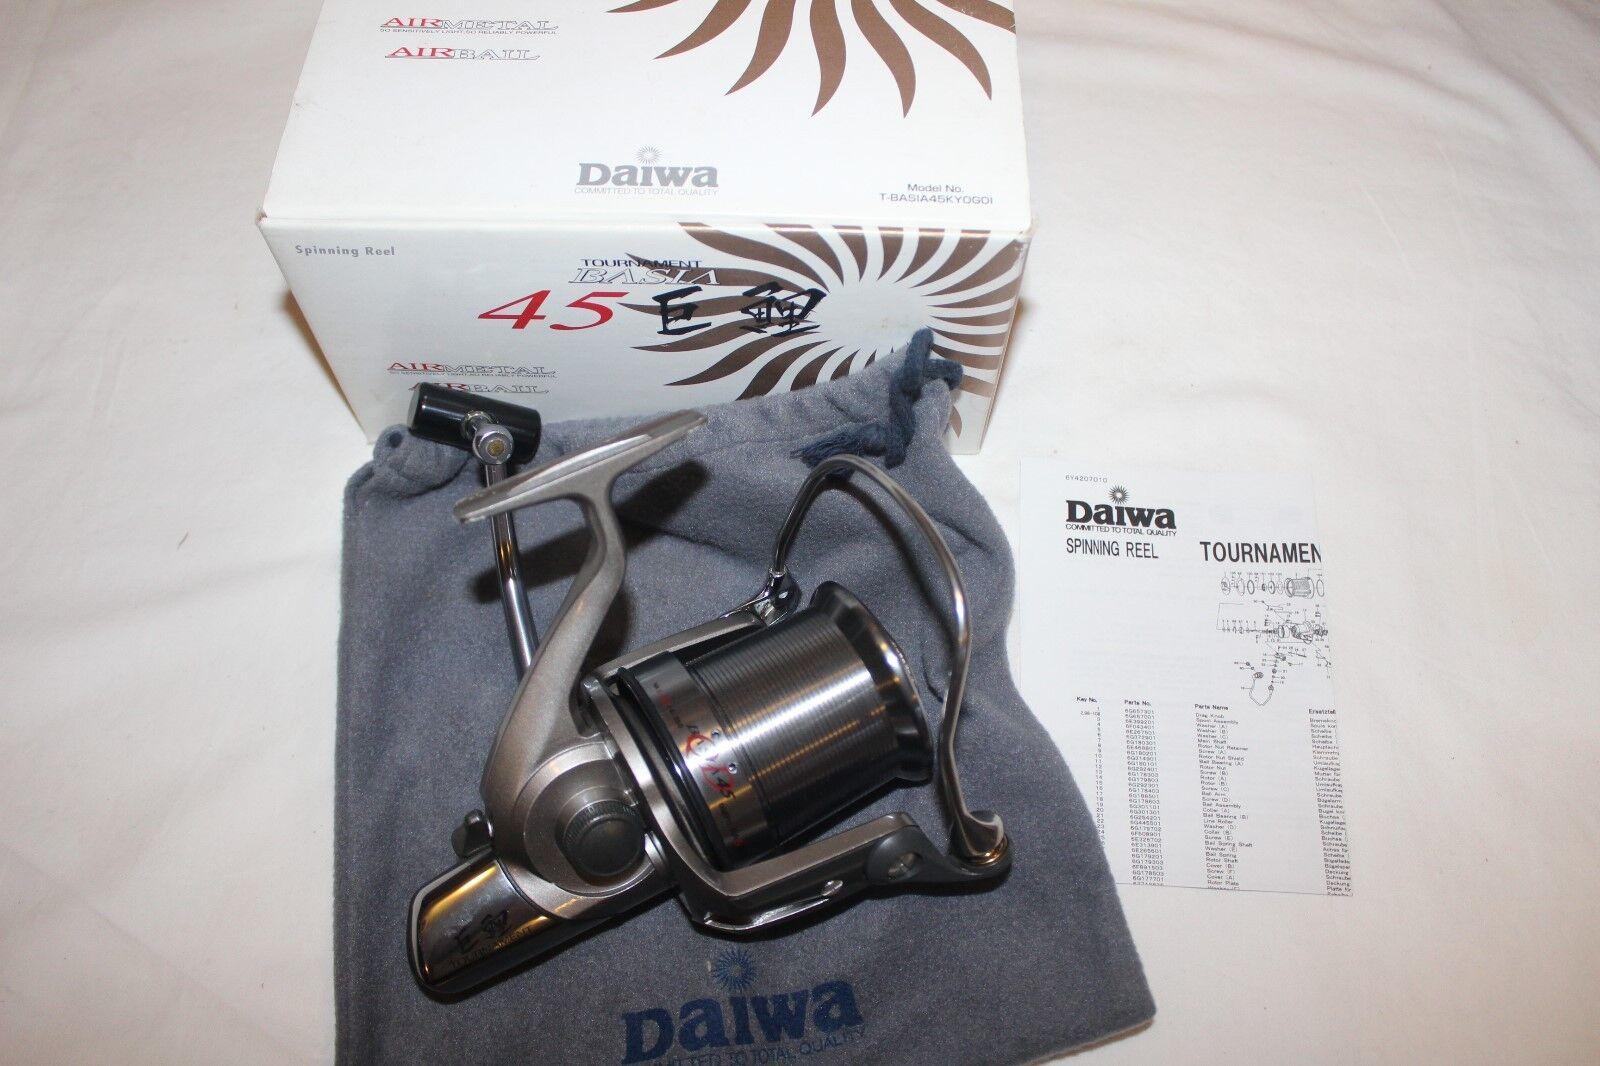 Daiwa Tournament Basia 45-im ovp-nr-1321